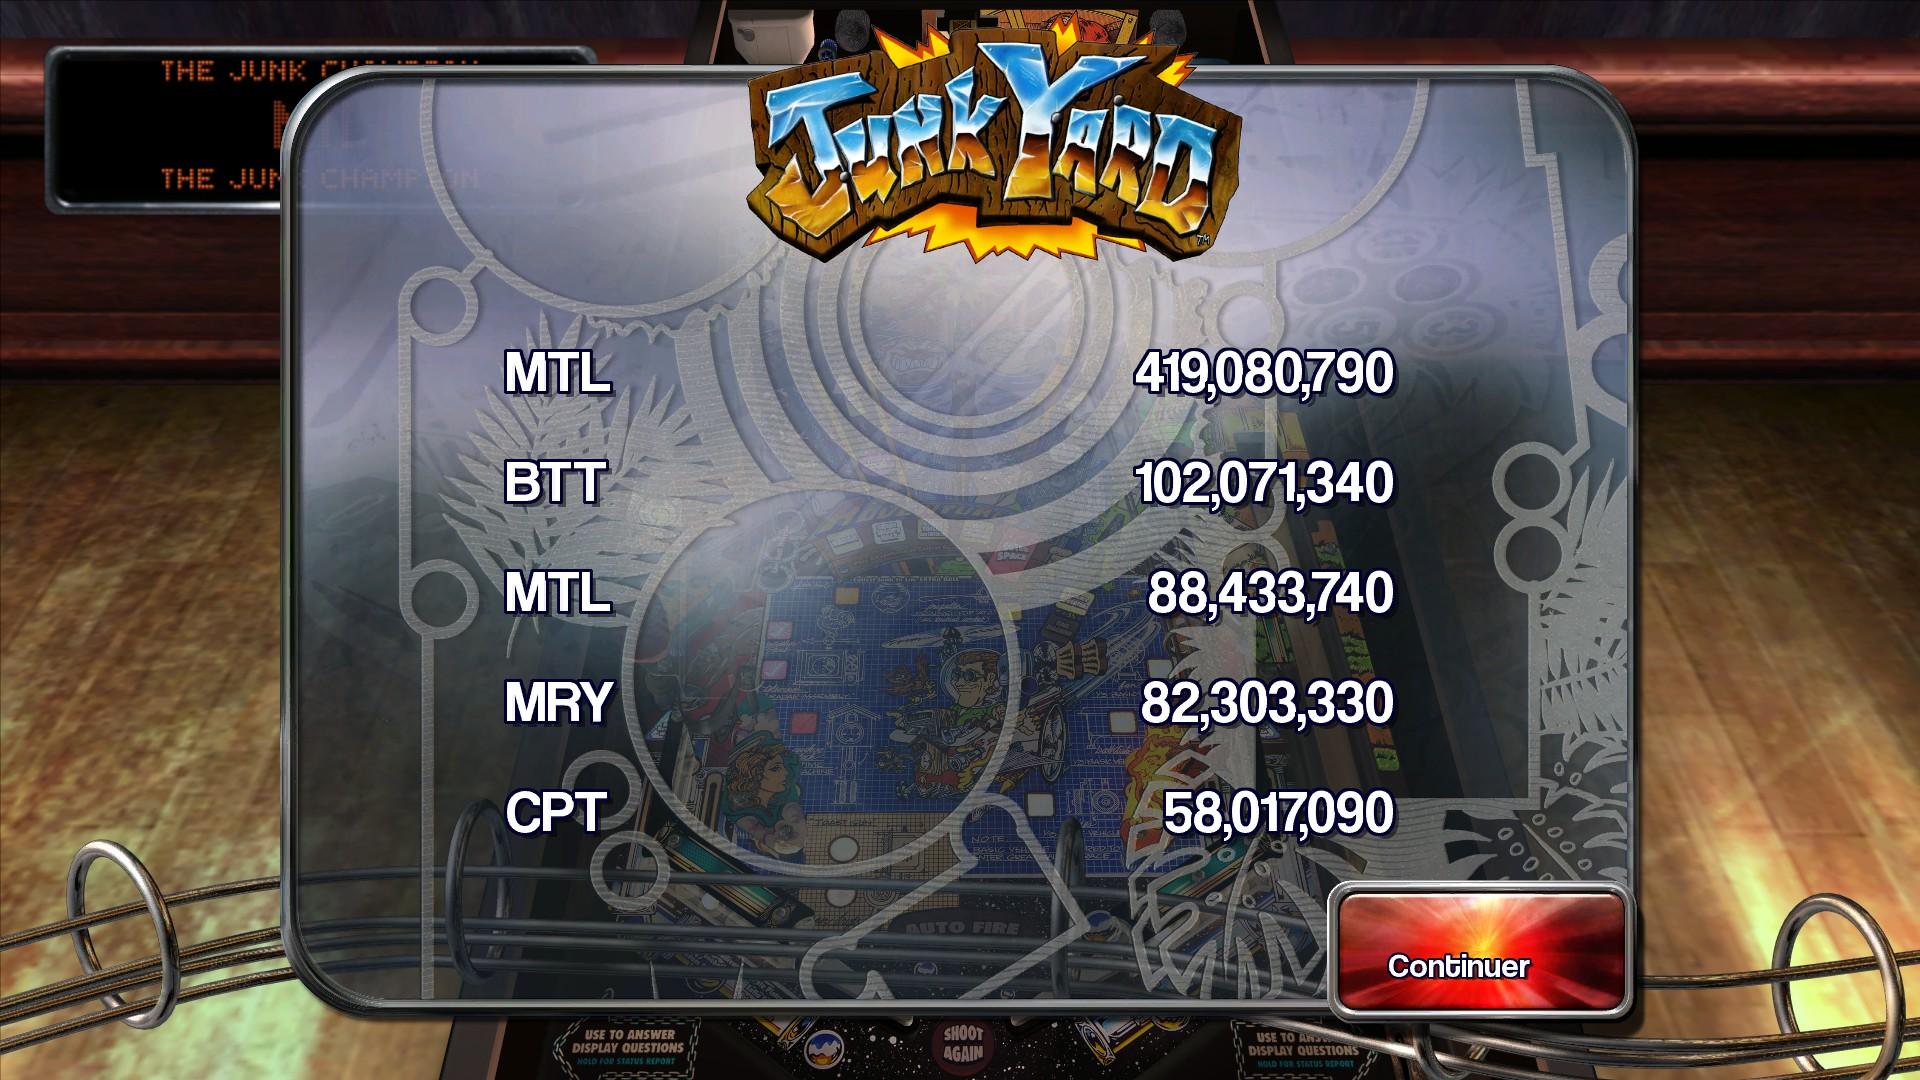 Mantalow: Pinball Arcade: JunkYard (PC) 419,080,790 points on 2016-01-04 21:59:07